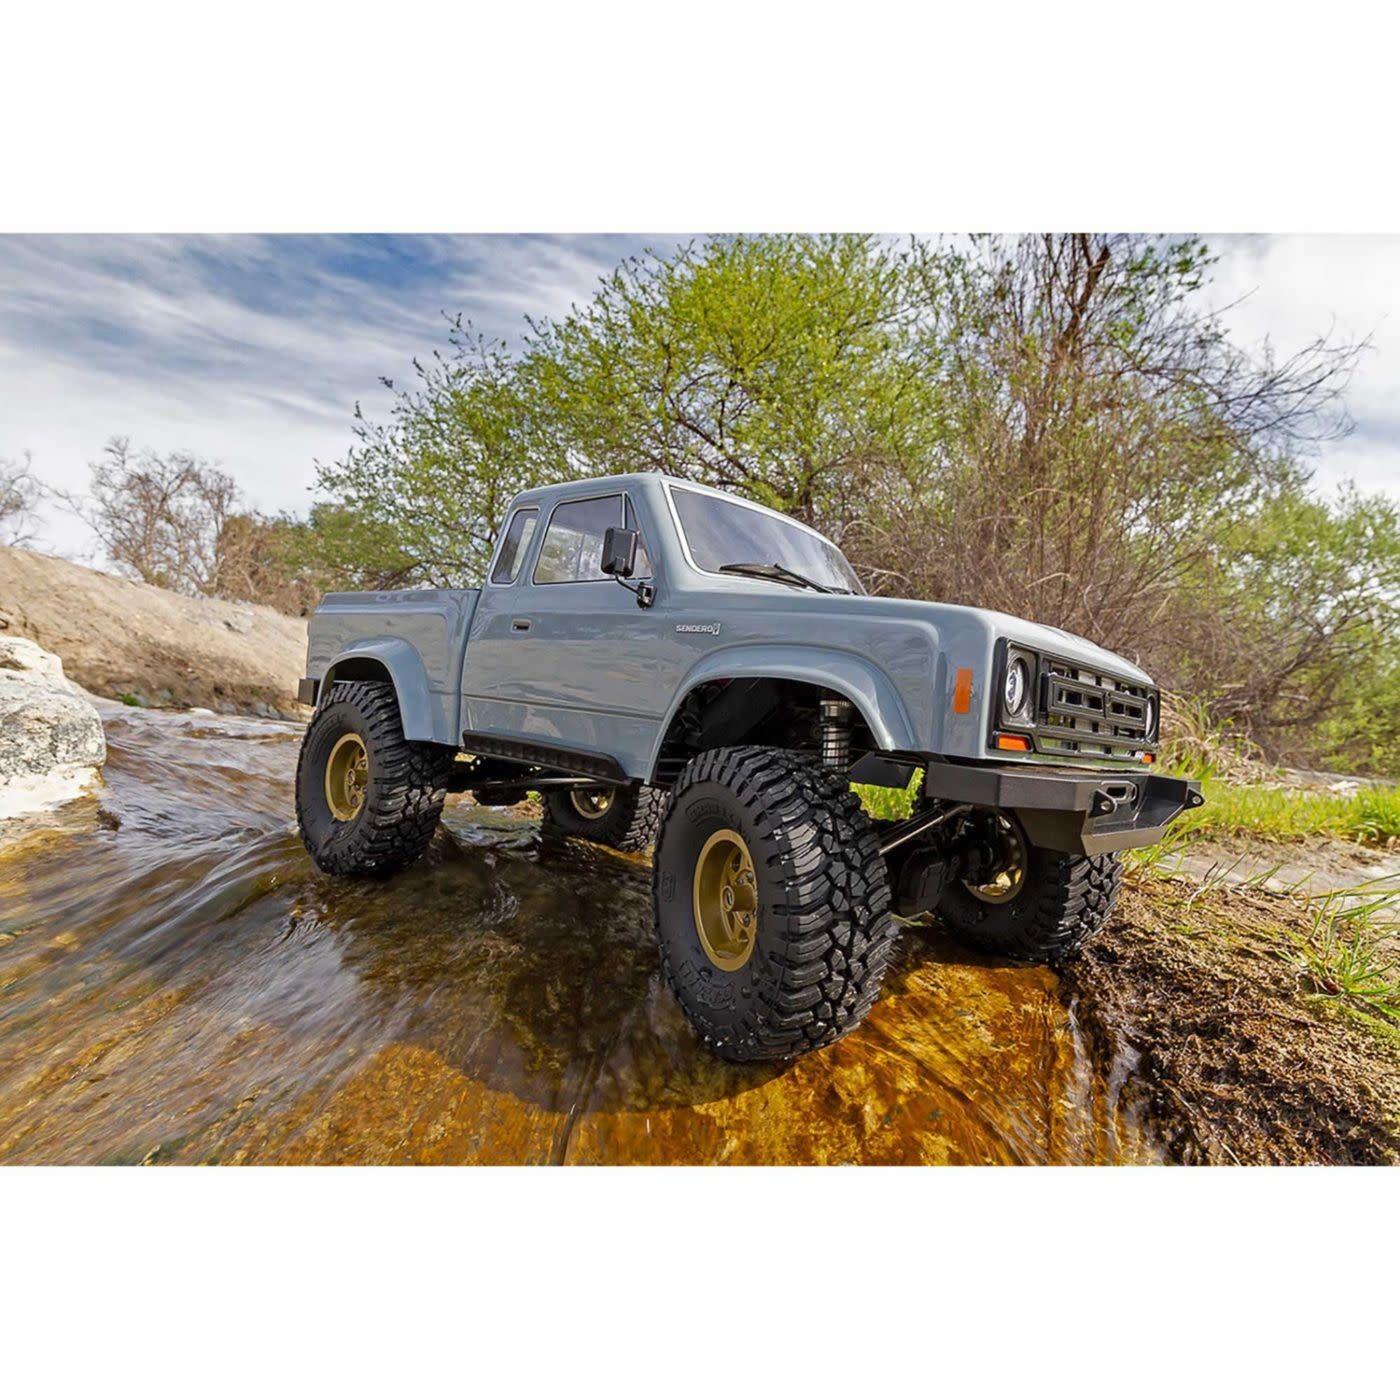 Team Associated - Element RC 1/10 Enduro Trail Truck, Sendero RTR